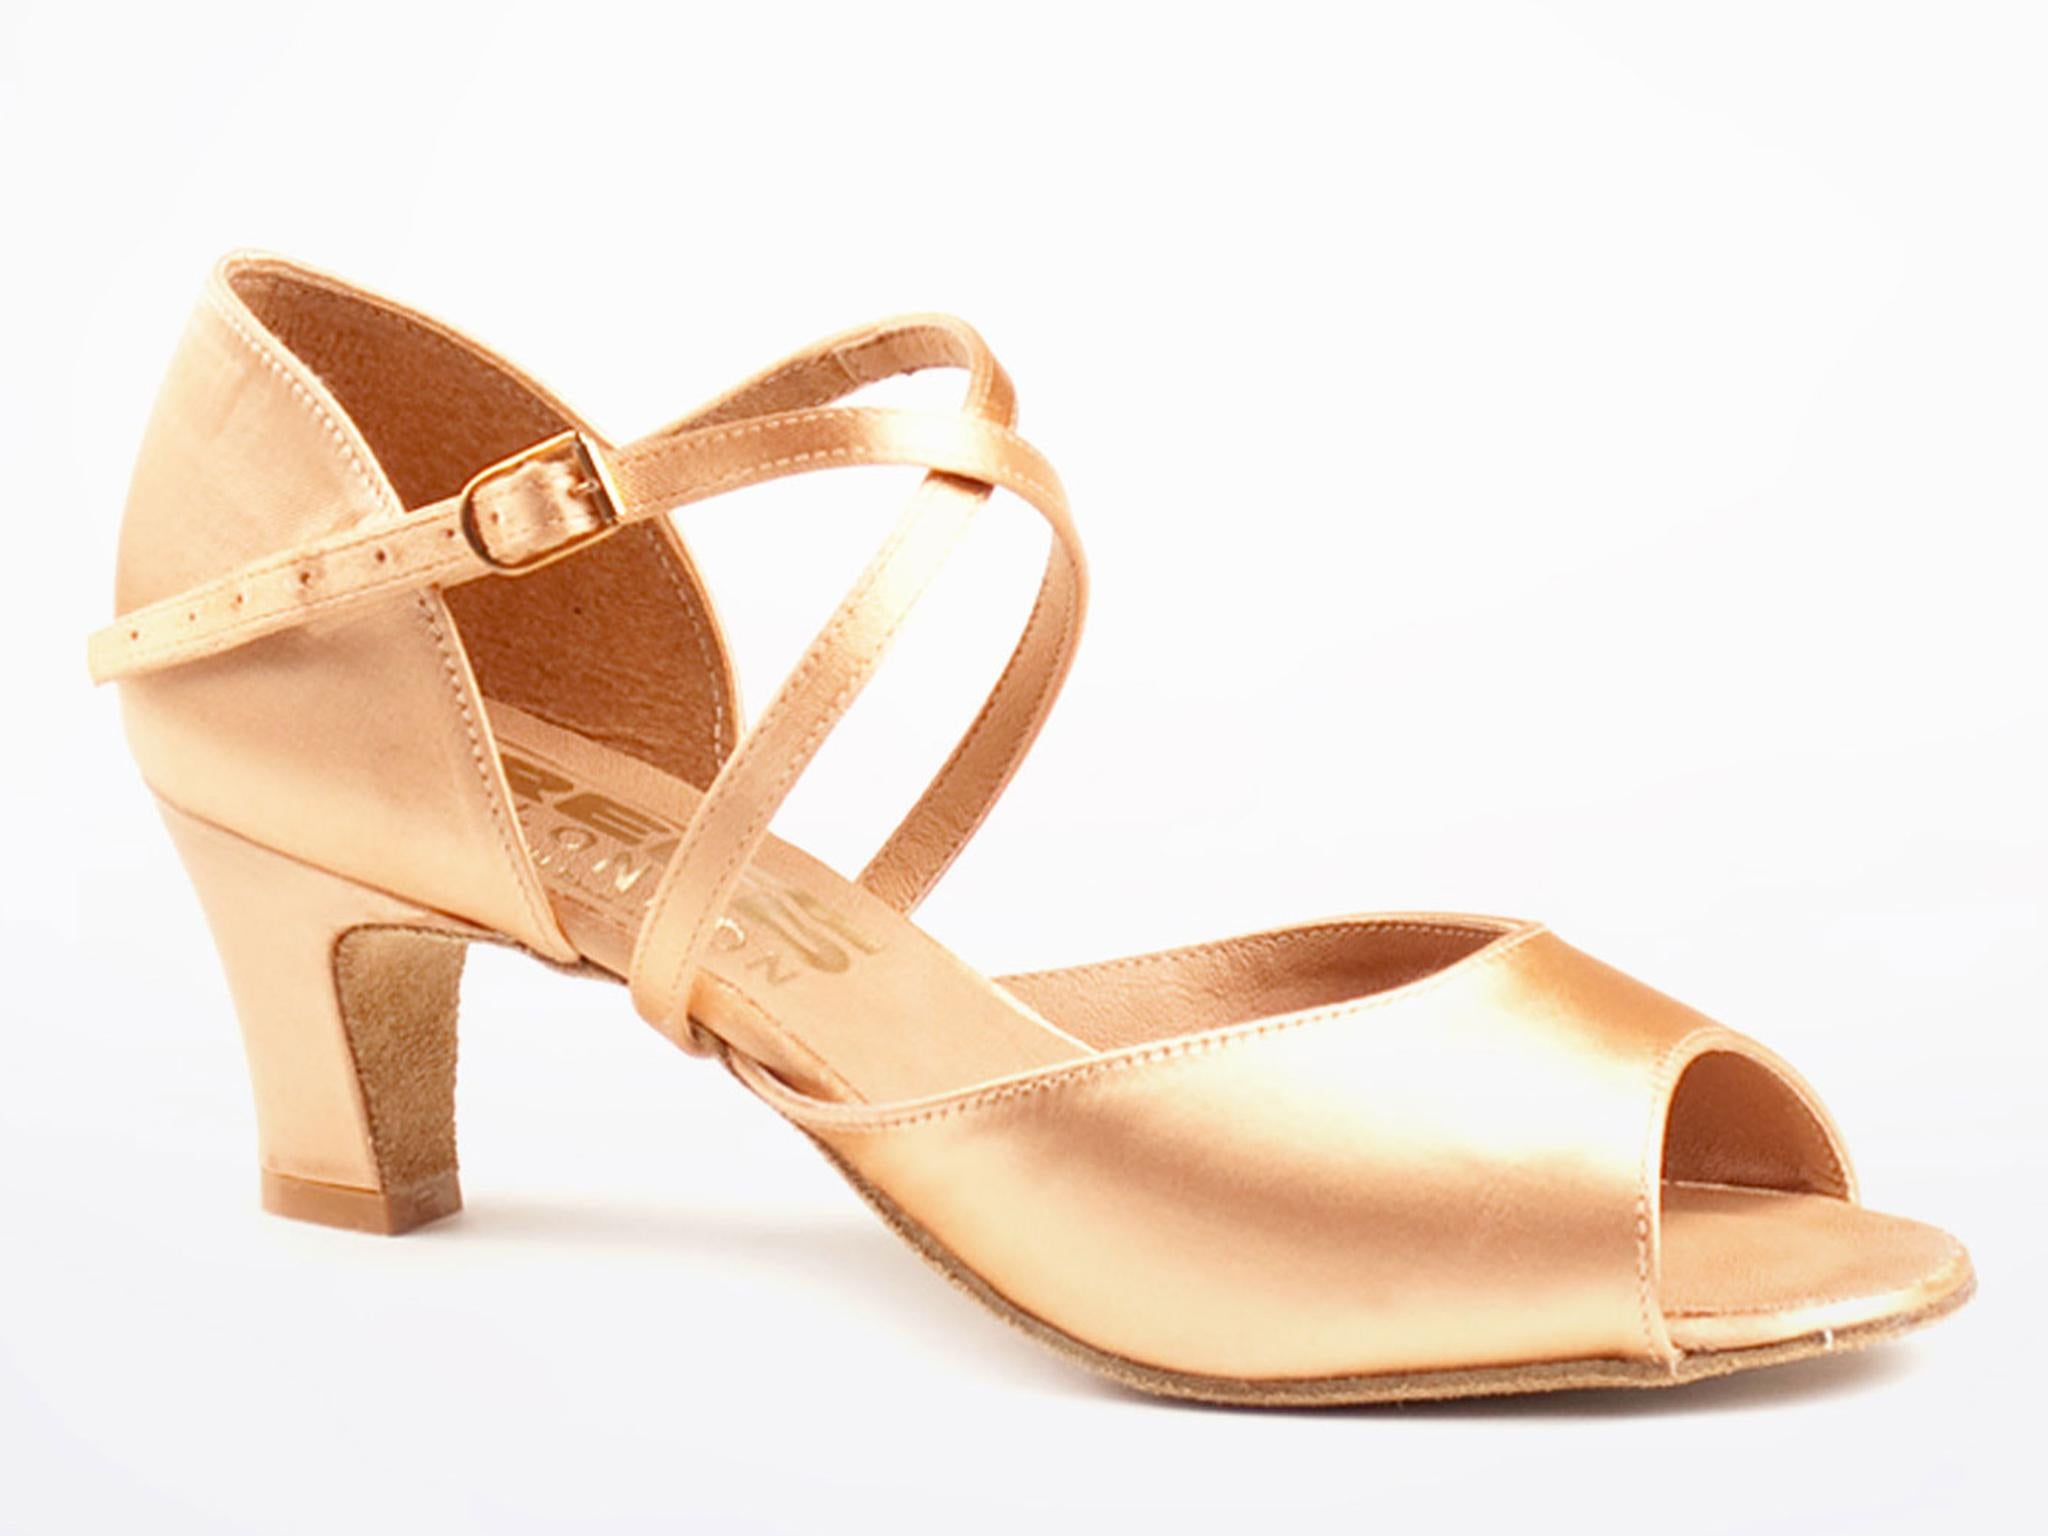 Dance ShoesBallroom HeelsHeels ClassShoe One Of A Kind Matching Mask and Dance Shoe Bag